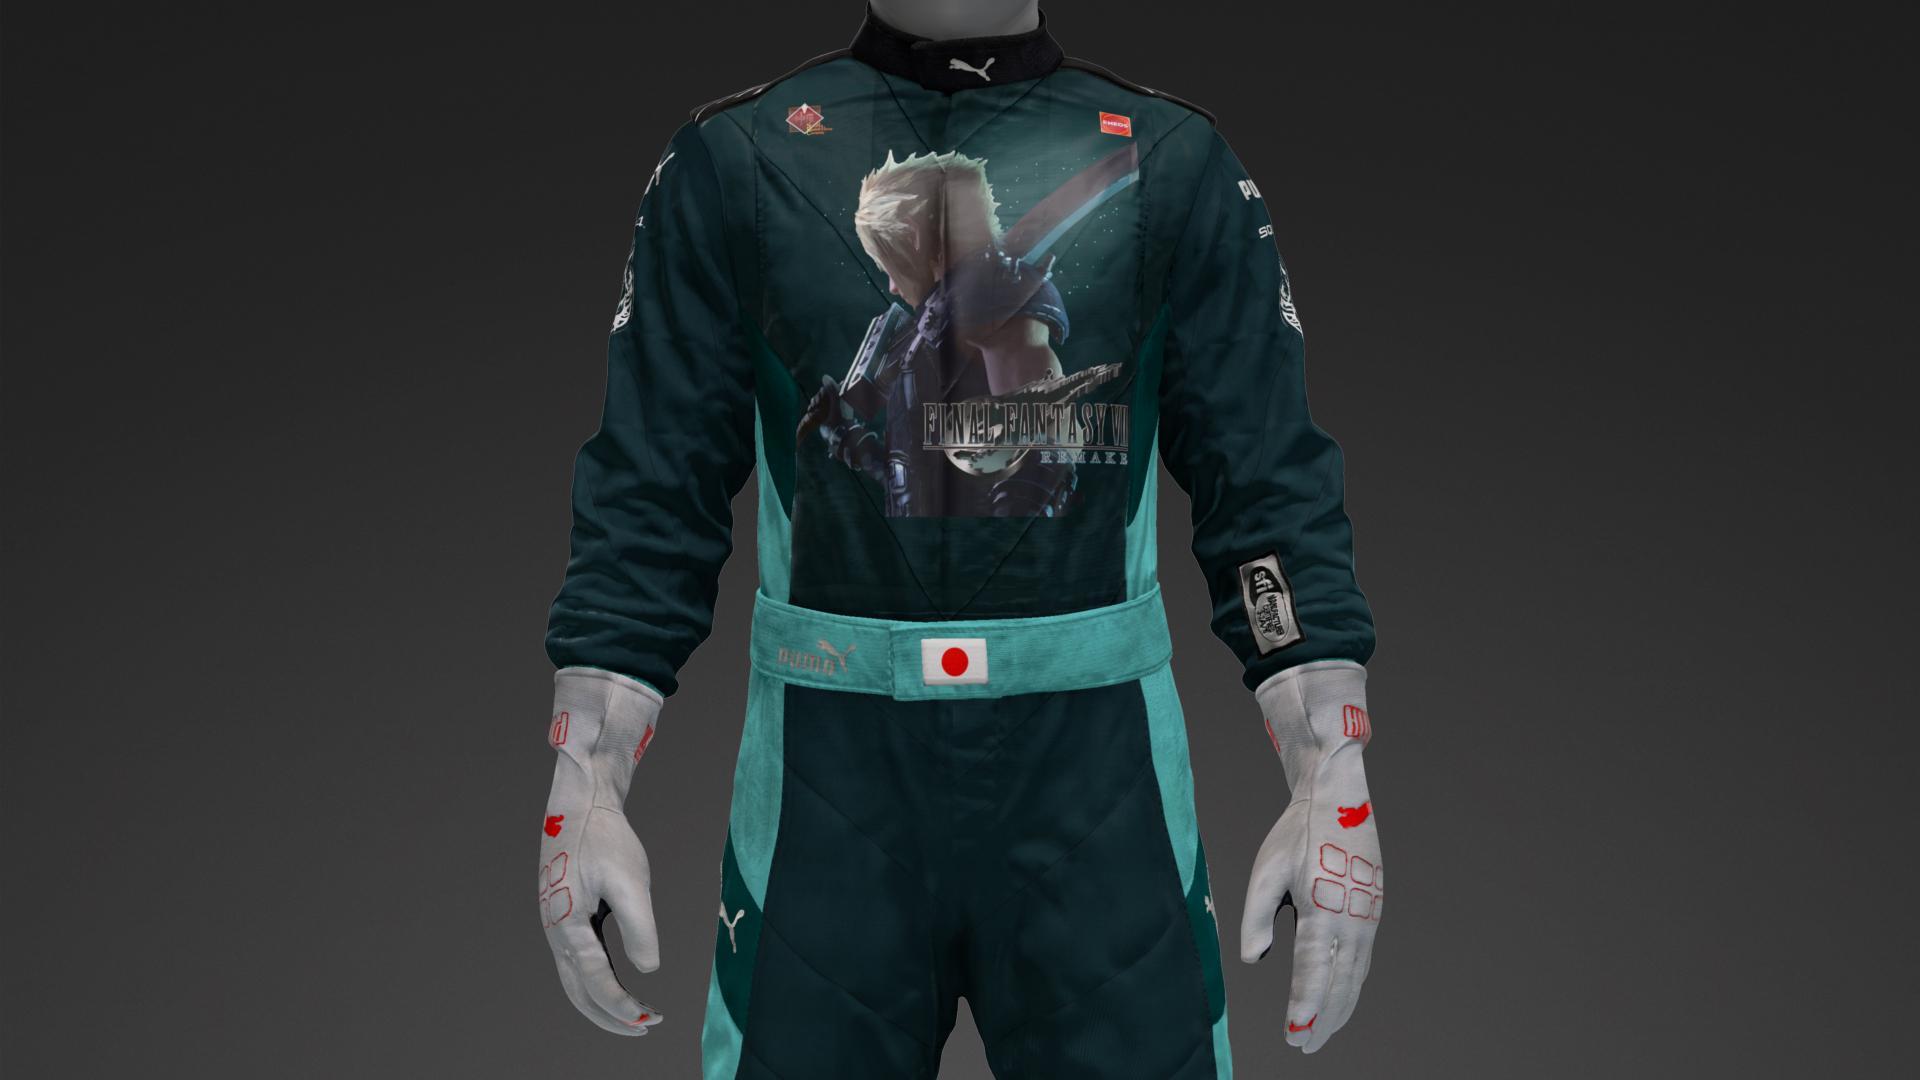 Valentino Rossi VR46 Moto GP Race WLF Noir T-shirt Officiel 2018